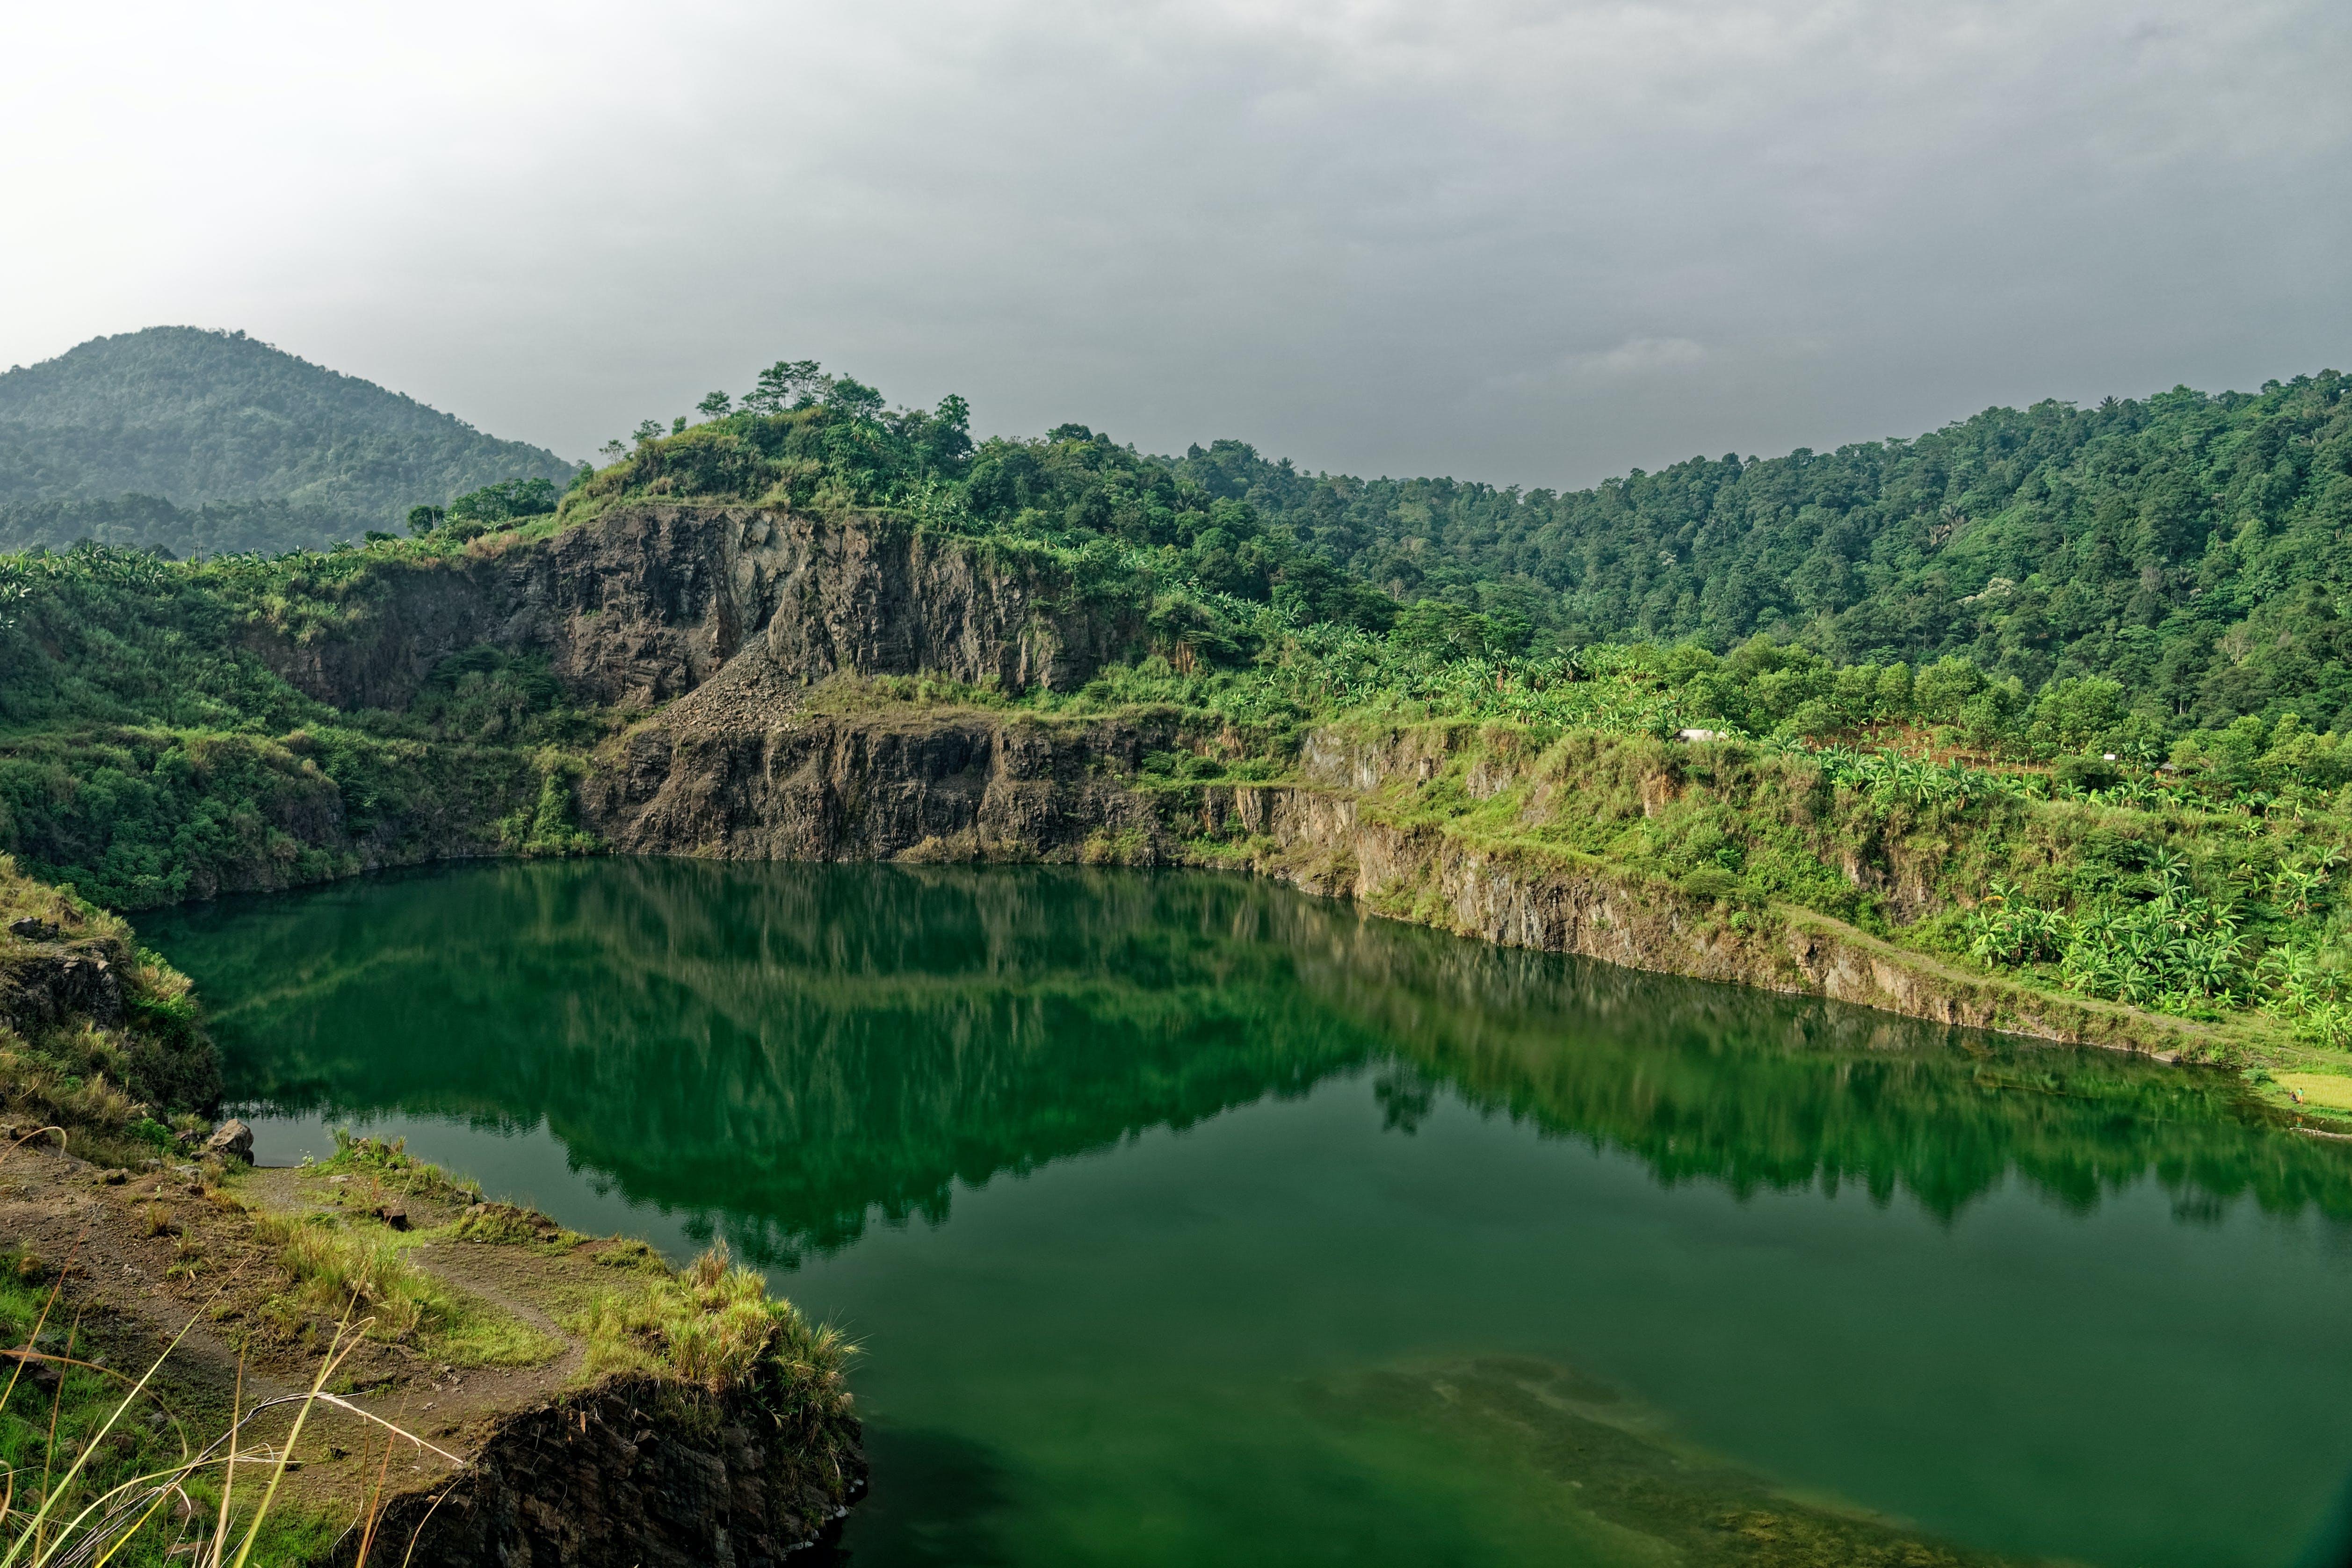 Bird's-eye View of Mountain Beside Body of Water